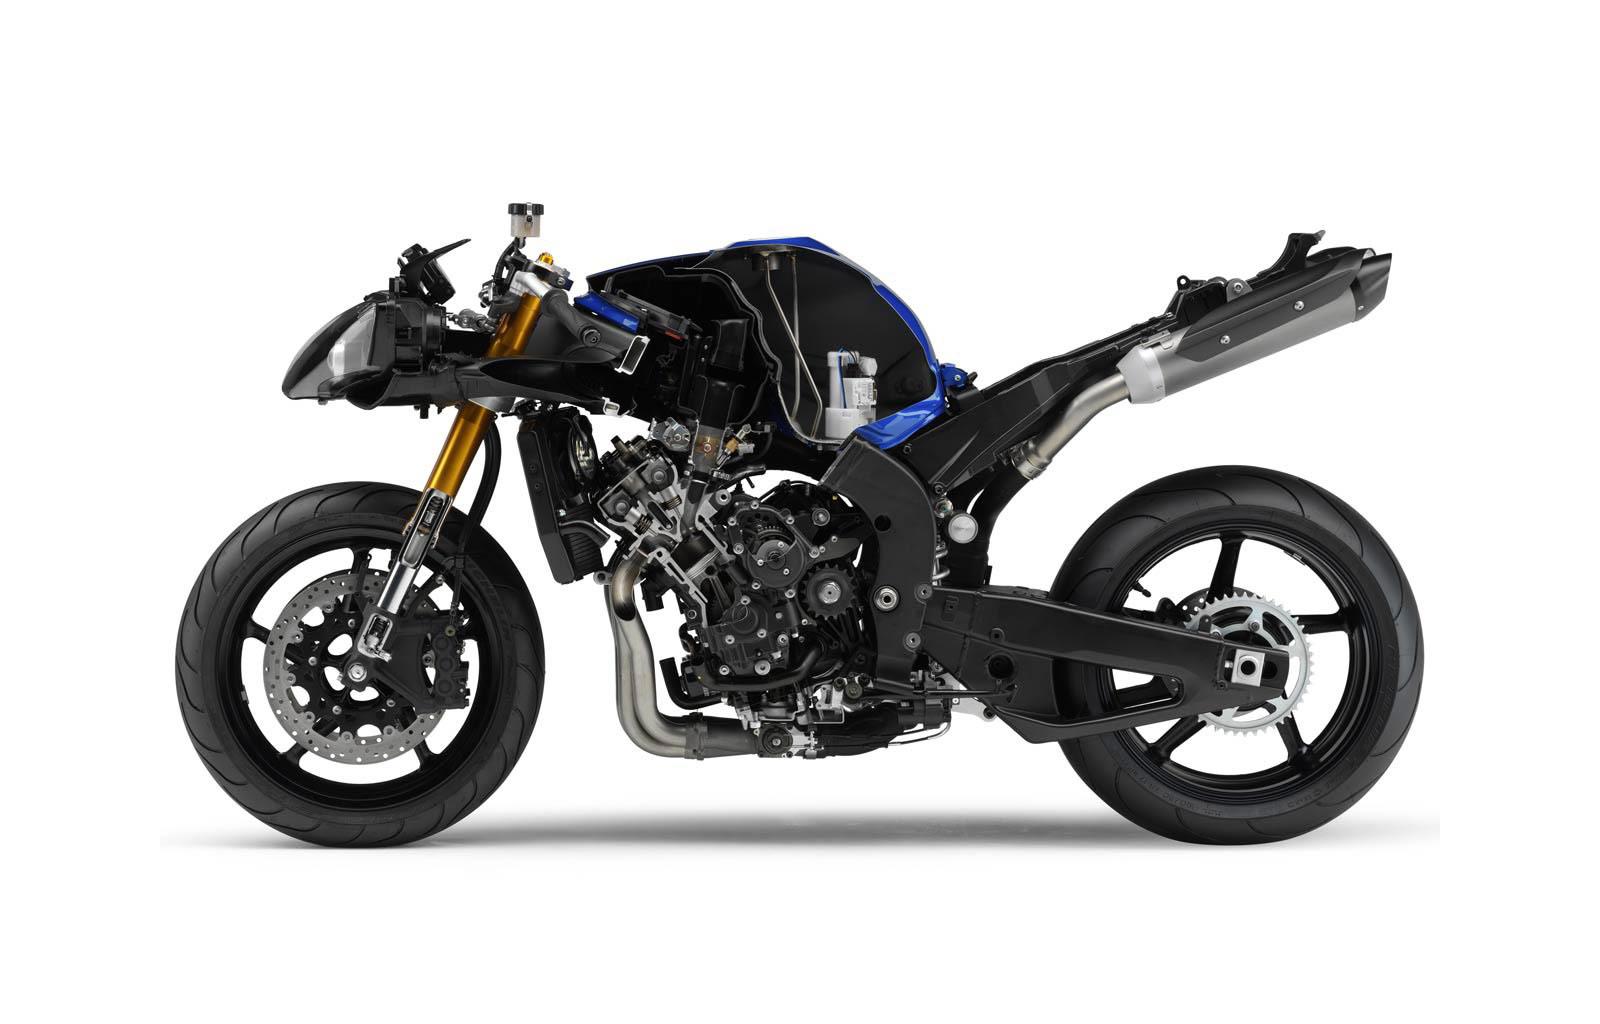 Yamaha YZF-R1 cutaway